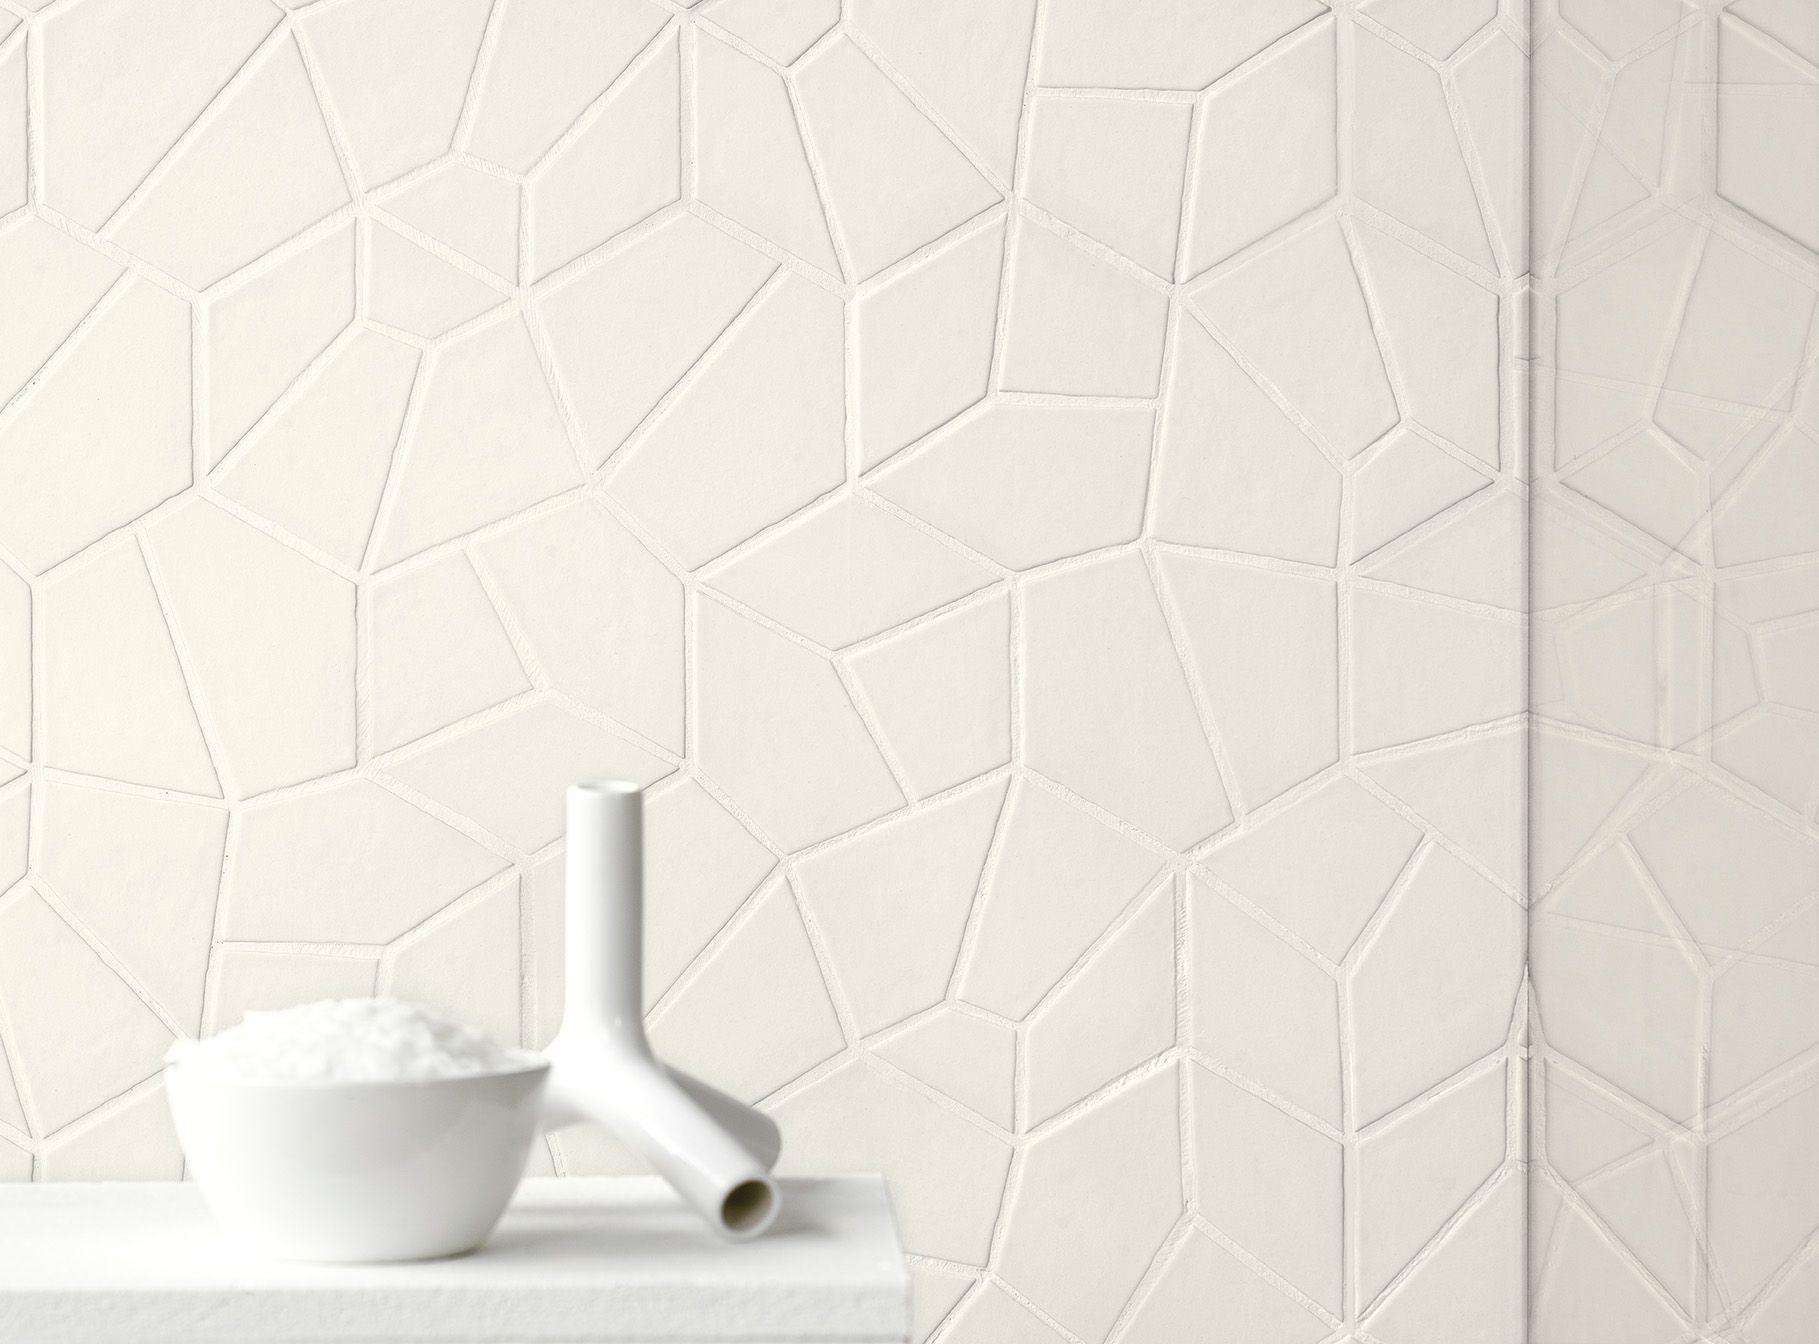 Brix tile dry vincent van duysen design outdoor and indoor use brix tile dry vincent van duysen design outdoor and indoor use saunas and dailygadgetfo Images